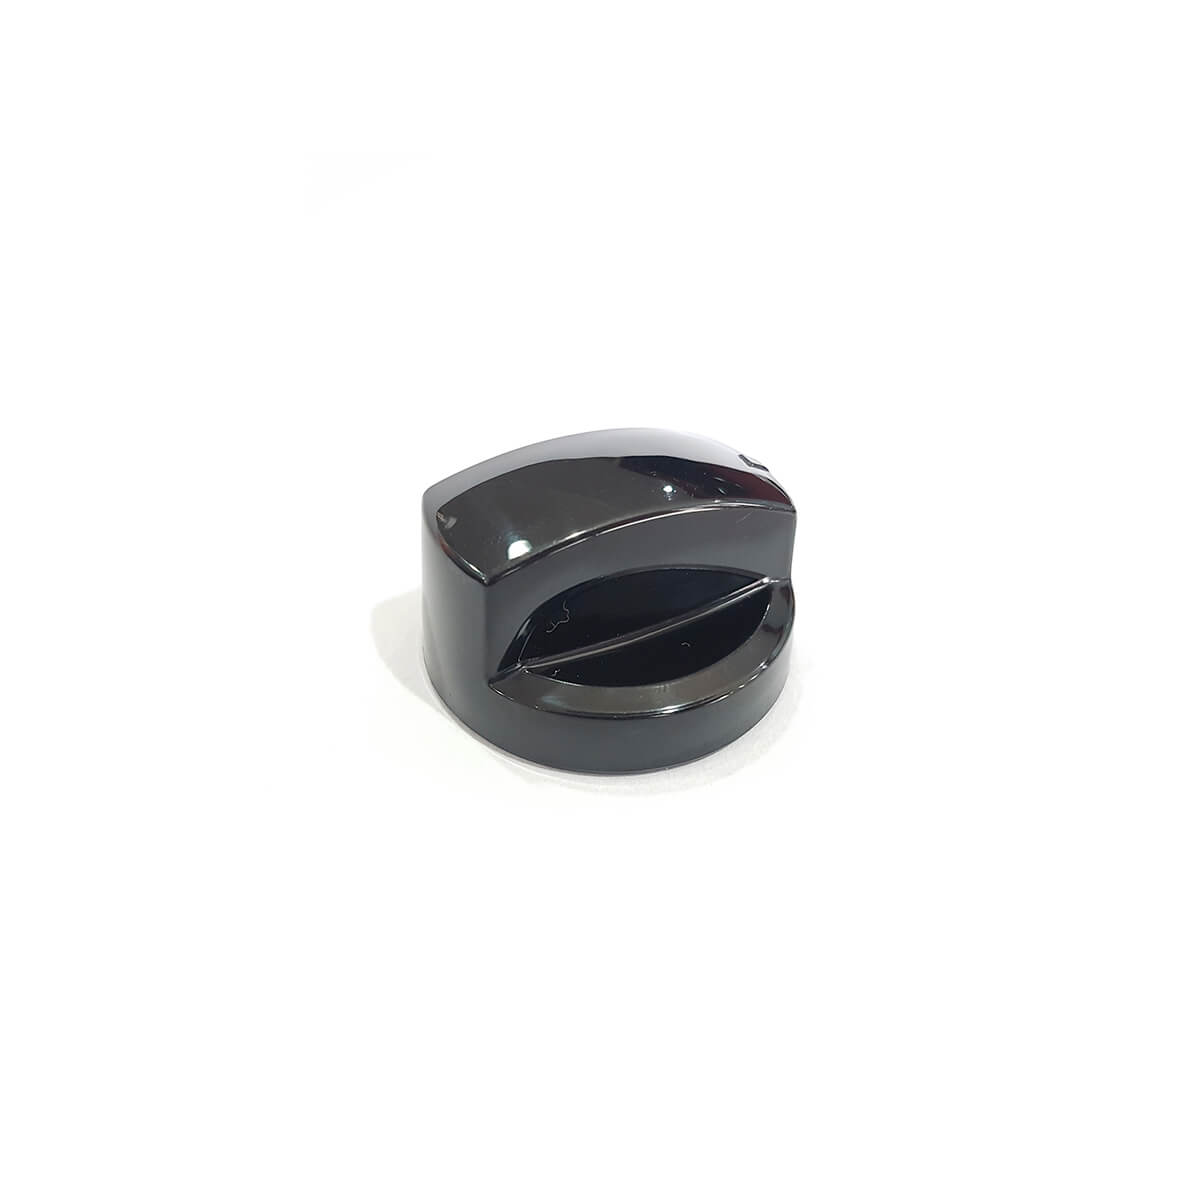 Manípulo Timer WI, SC Para Fogão Electrolux -  A11211701